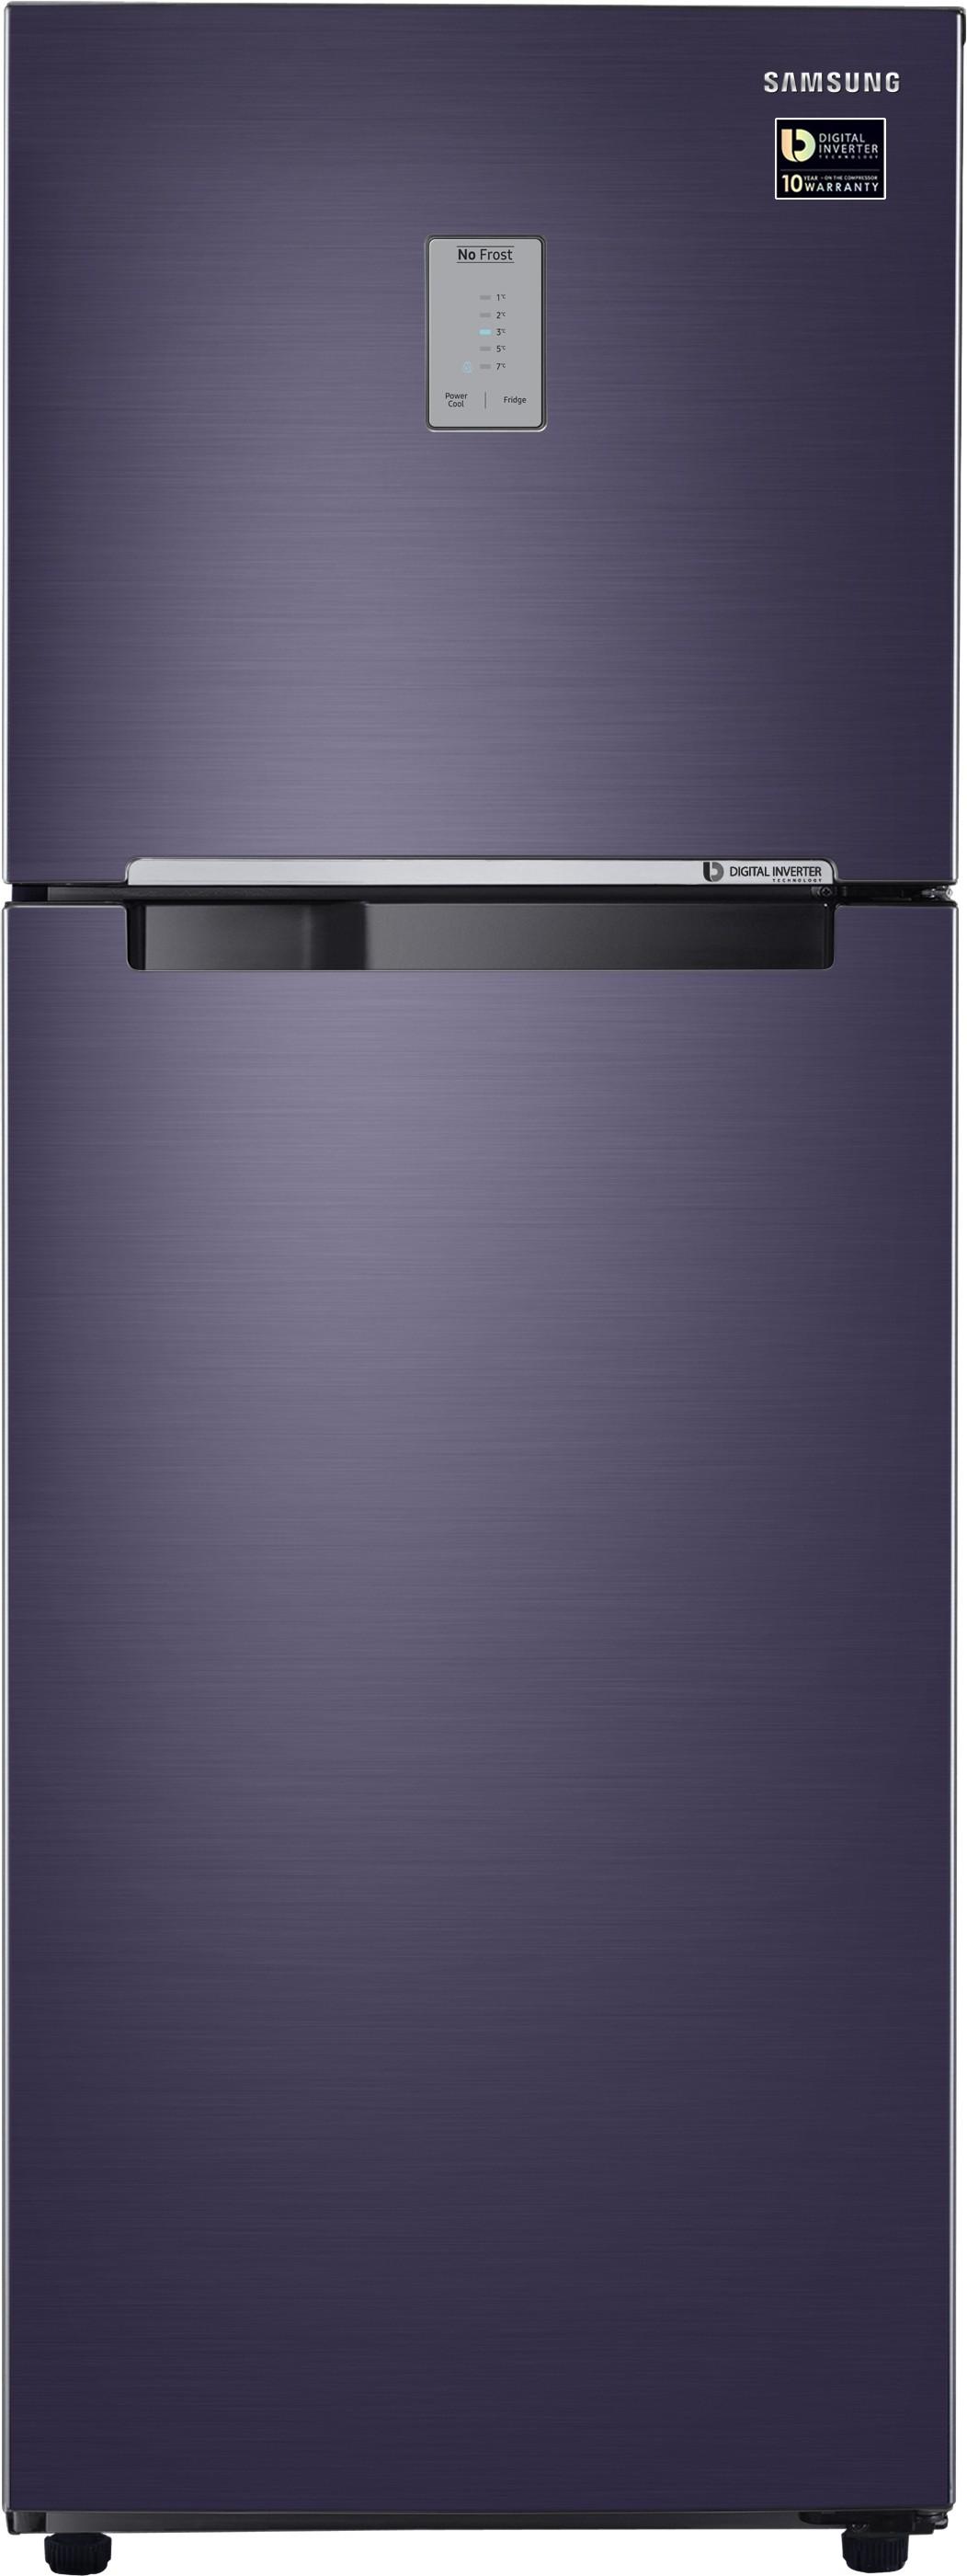 SAMSUNG 321 L Frost Free Double Door Refrigerator(RT34M3444UT/HL, Pebble Blue, 2017) (Samsung) Tamil Nadu Buy Online